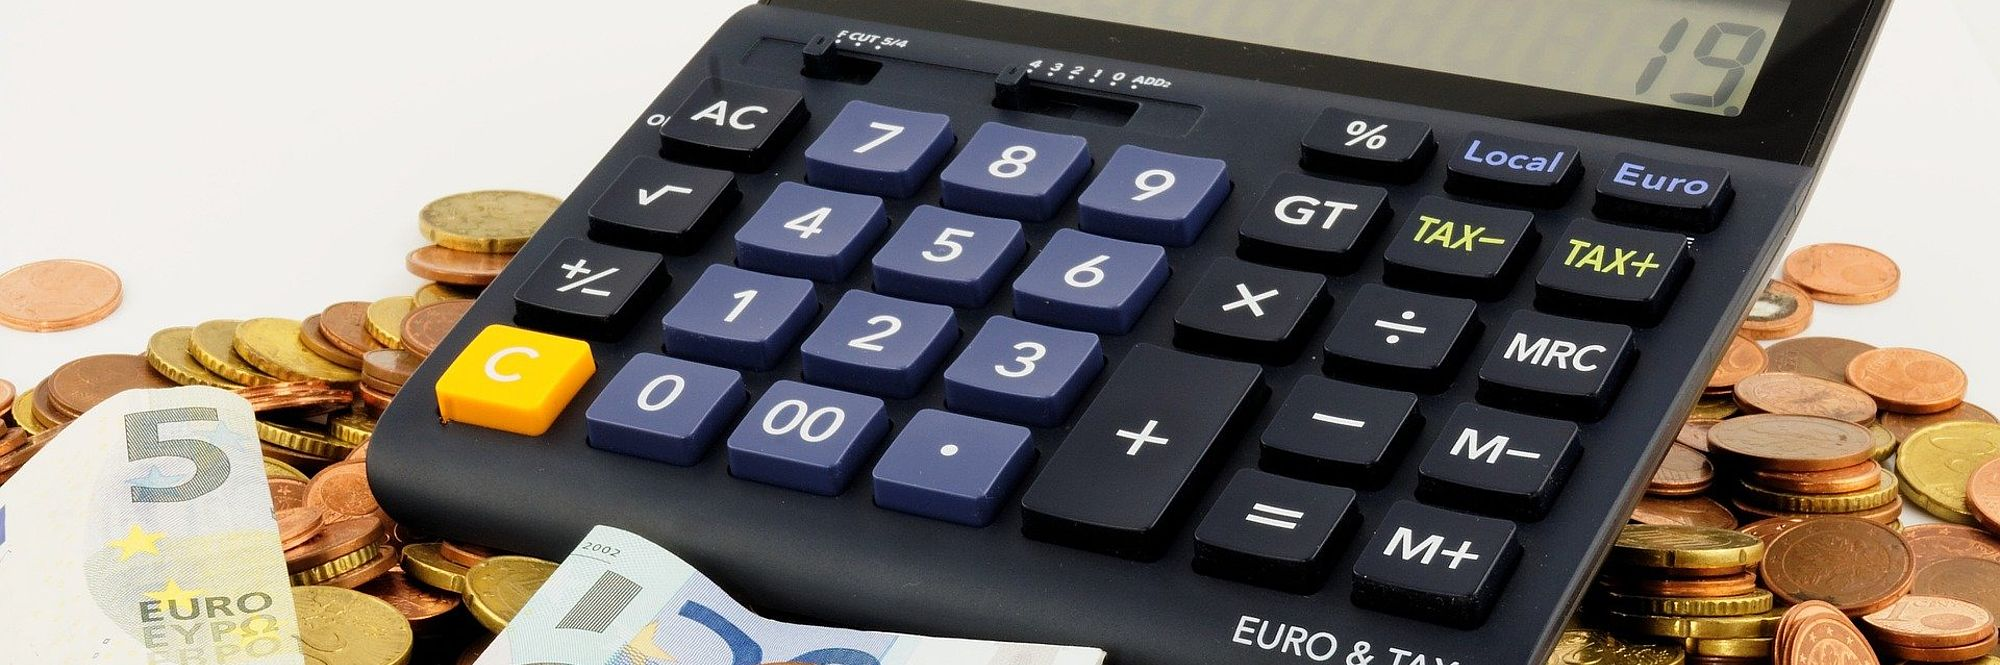 Immagine generica calcolatrice